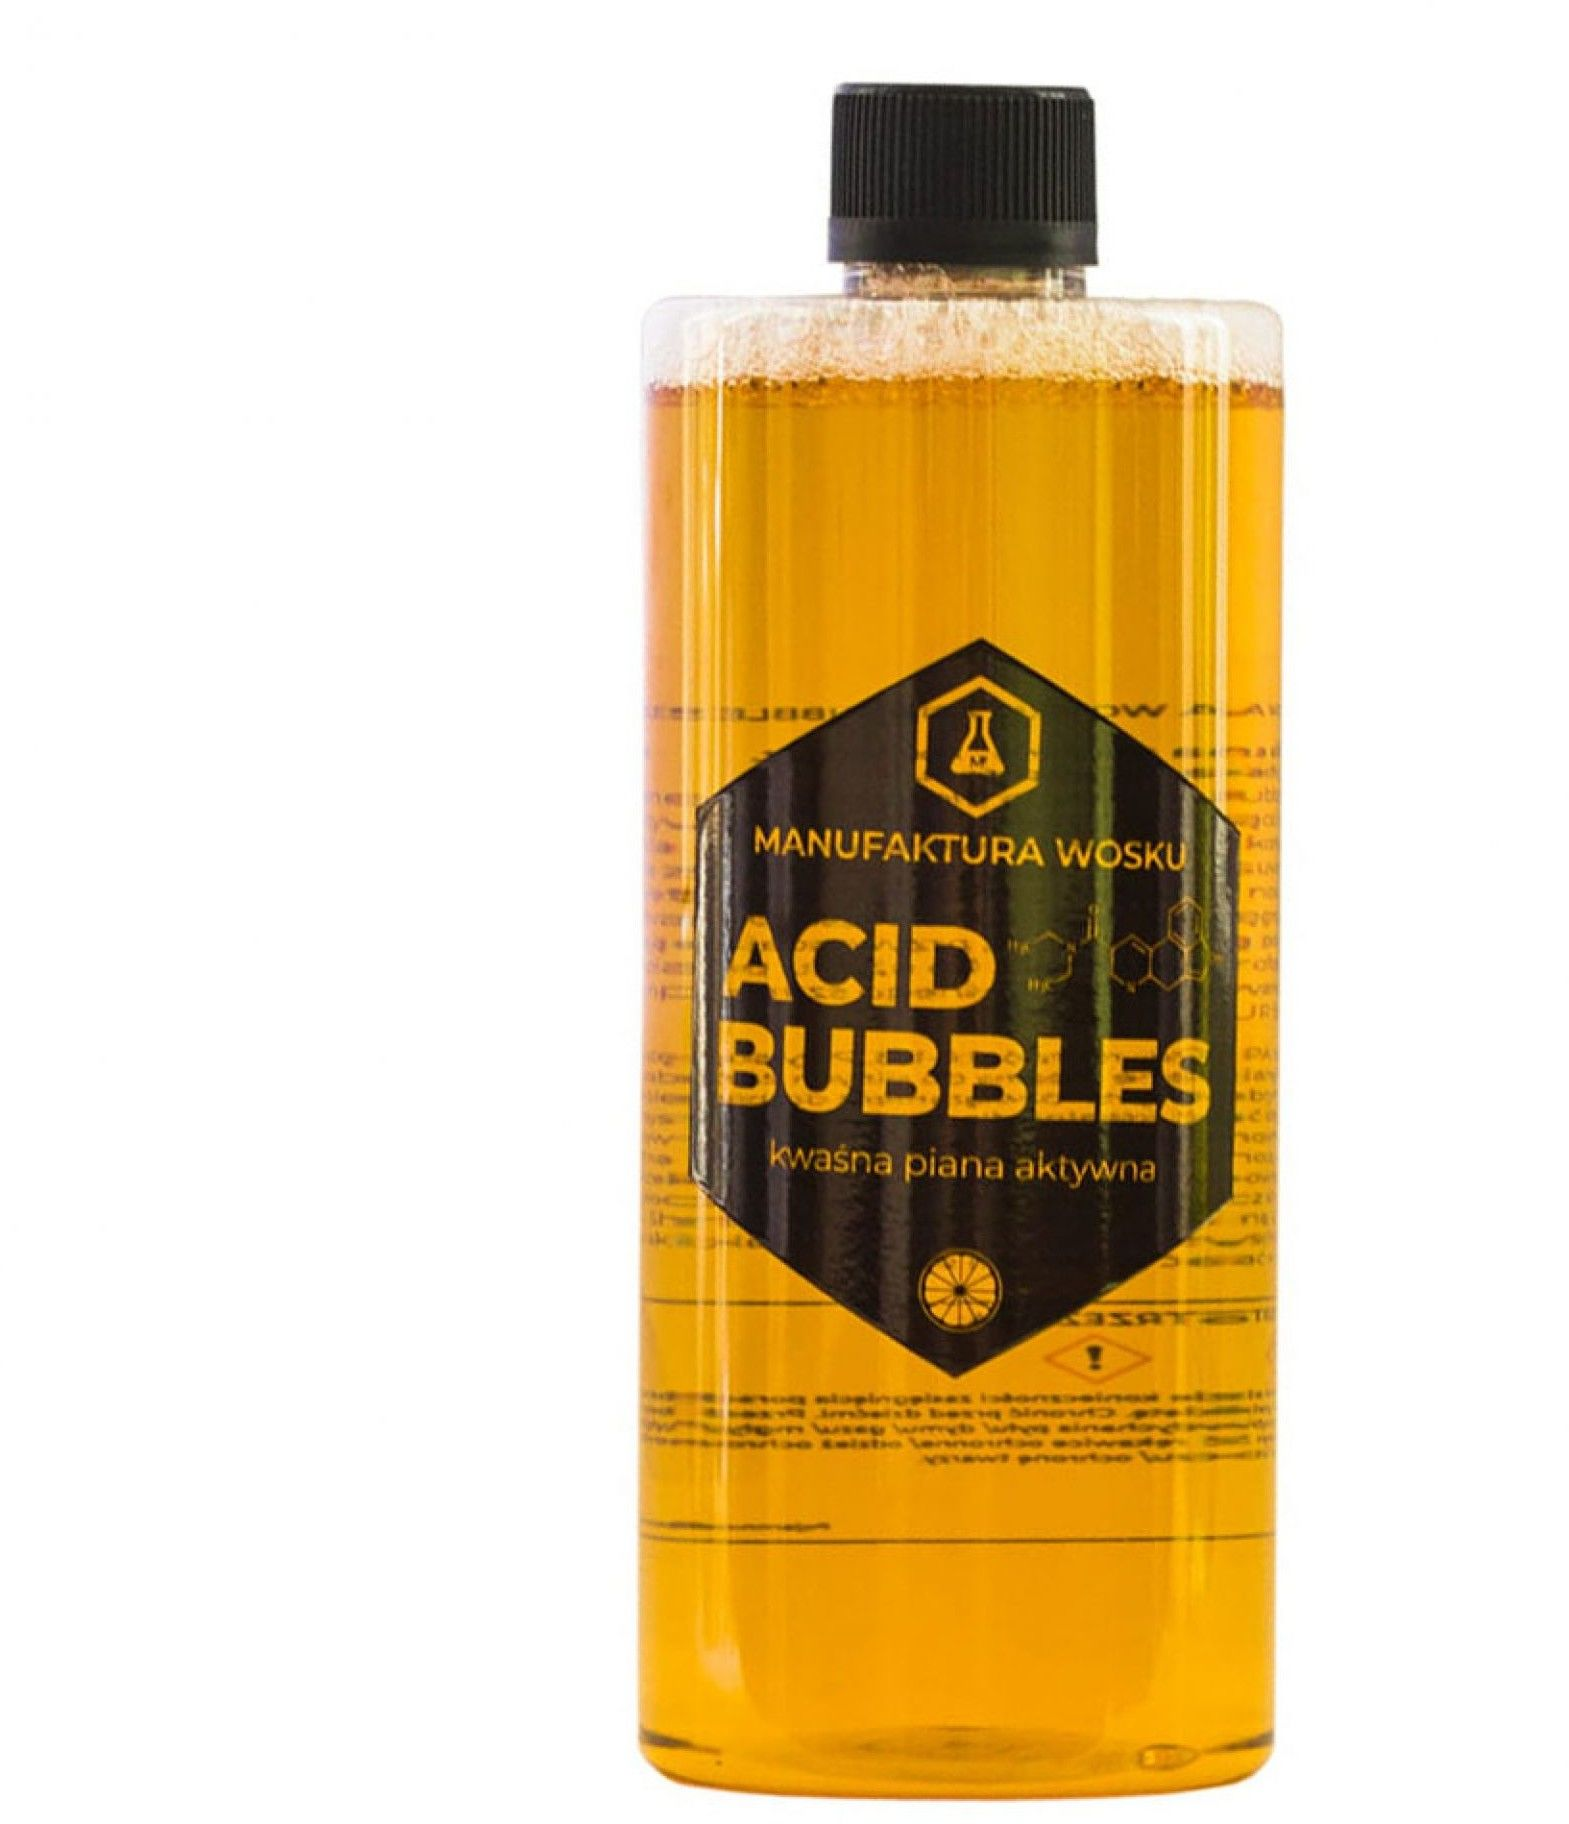 Acid Bubbles Manufaktura wosku 1l - kwaśna piana aktywna